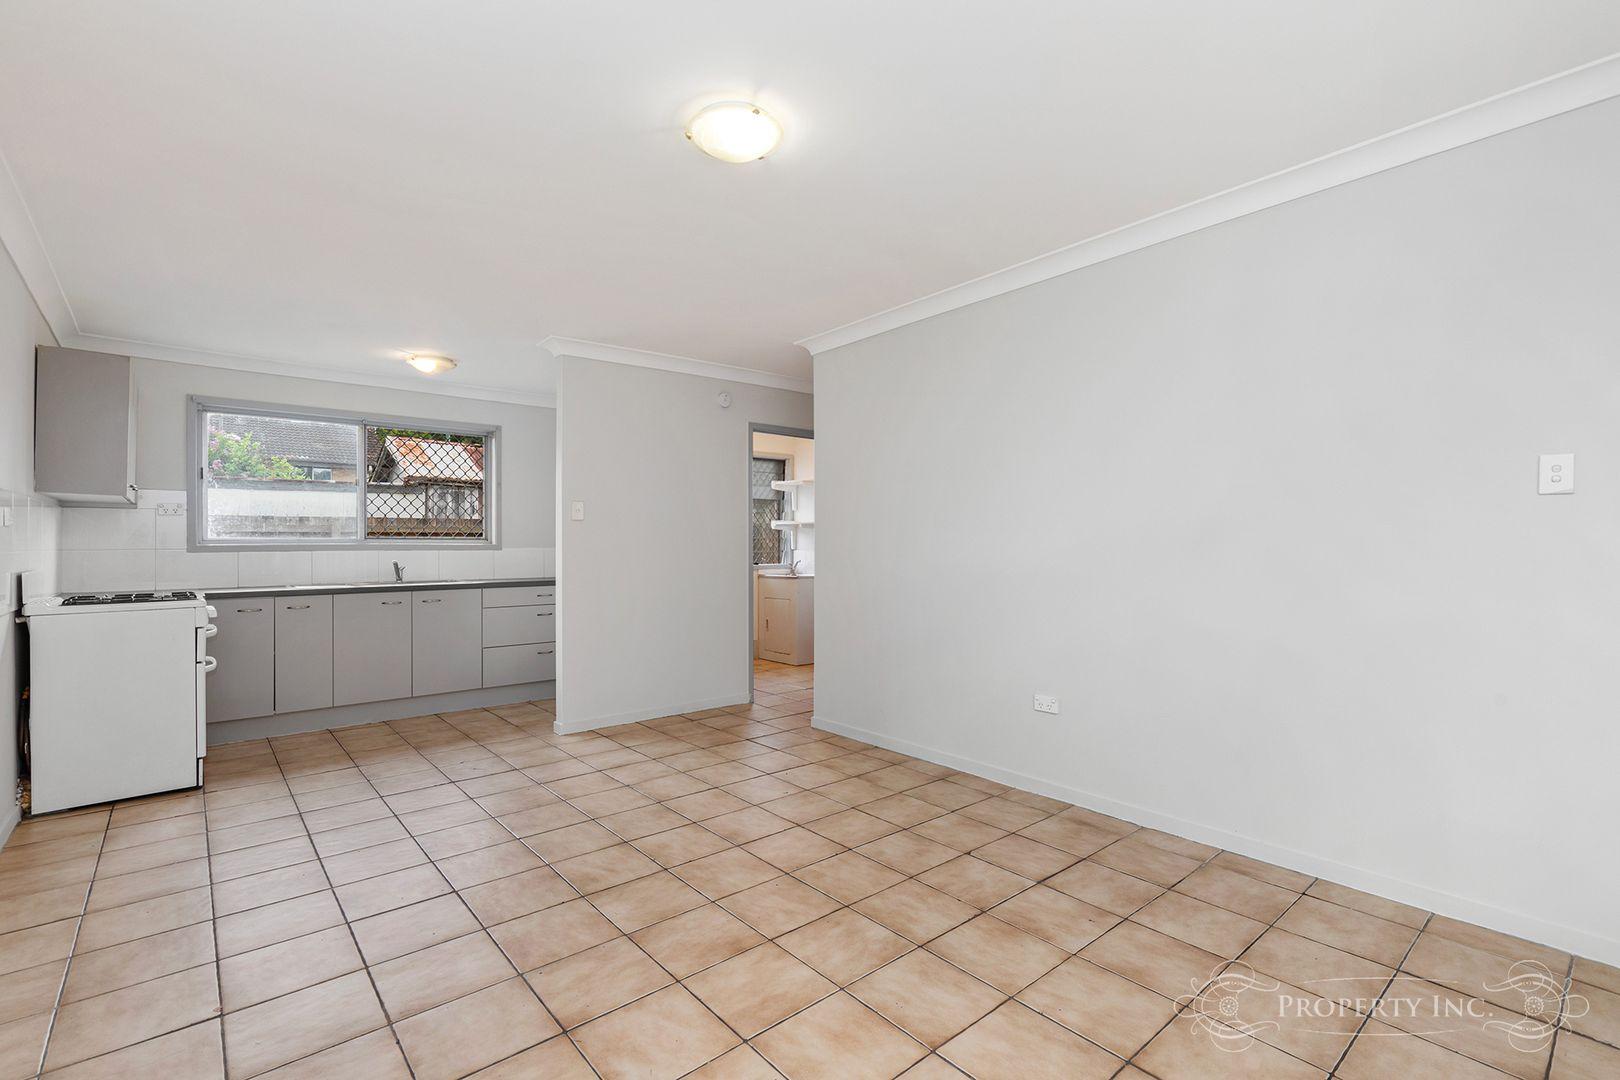 3/45 Golf Links Road, Rocklea QLD 4106, Image 2